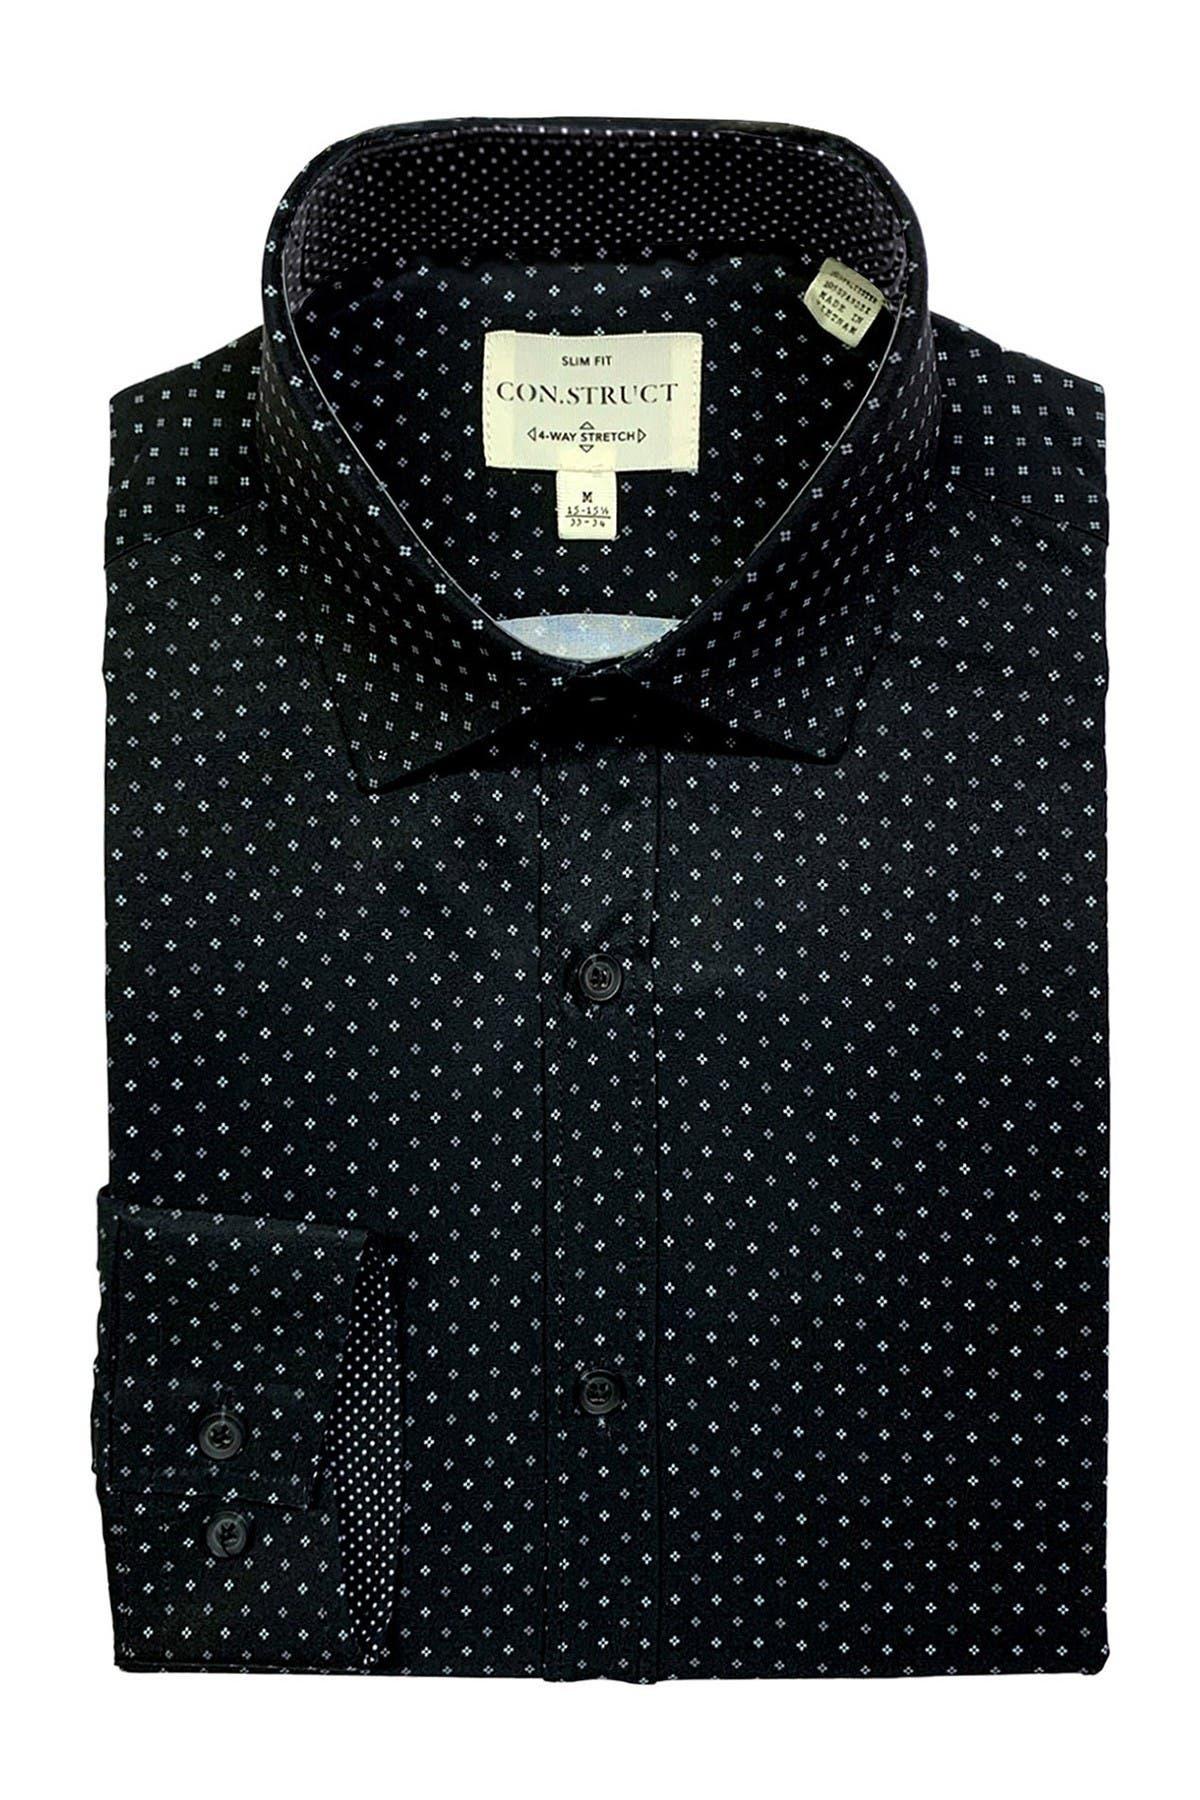 Image of CONSTRUCT 4-Way Stretch Slim Fit Ditsy Dot Print Dress Shirt